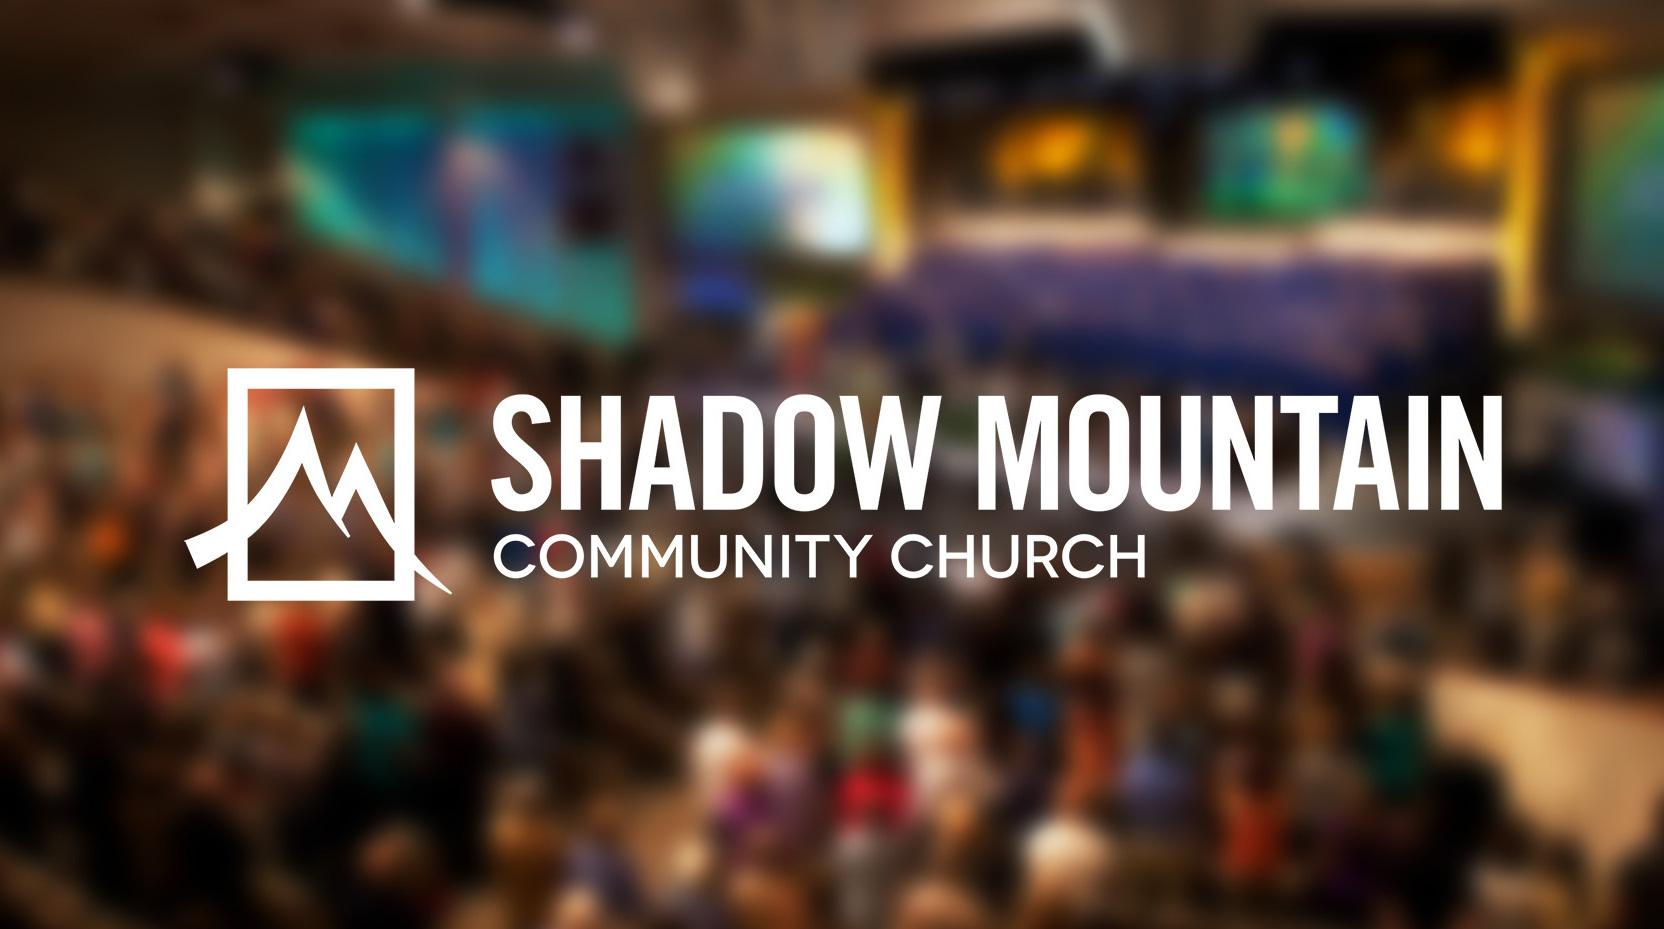 Shadow Mountain Community Church Christmas Schedule 2020 Shadow Mountain Community Church on Livestream